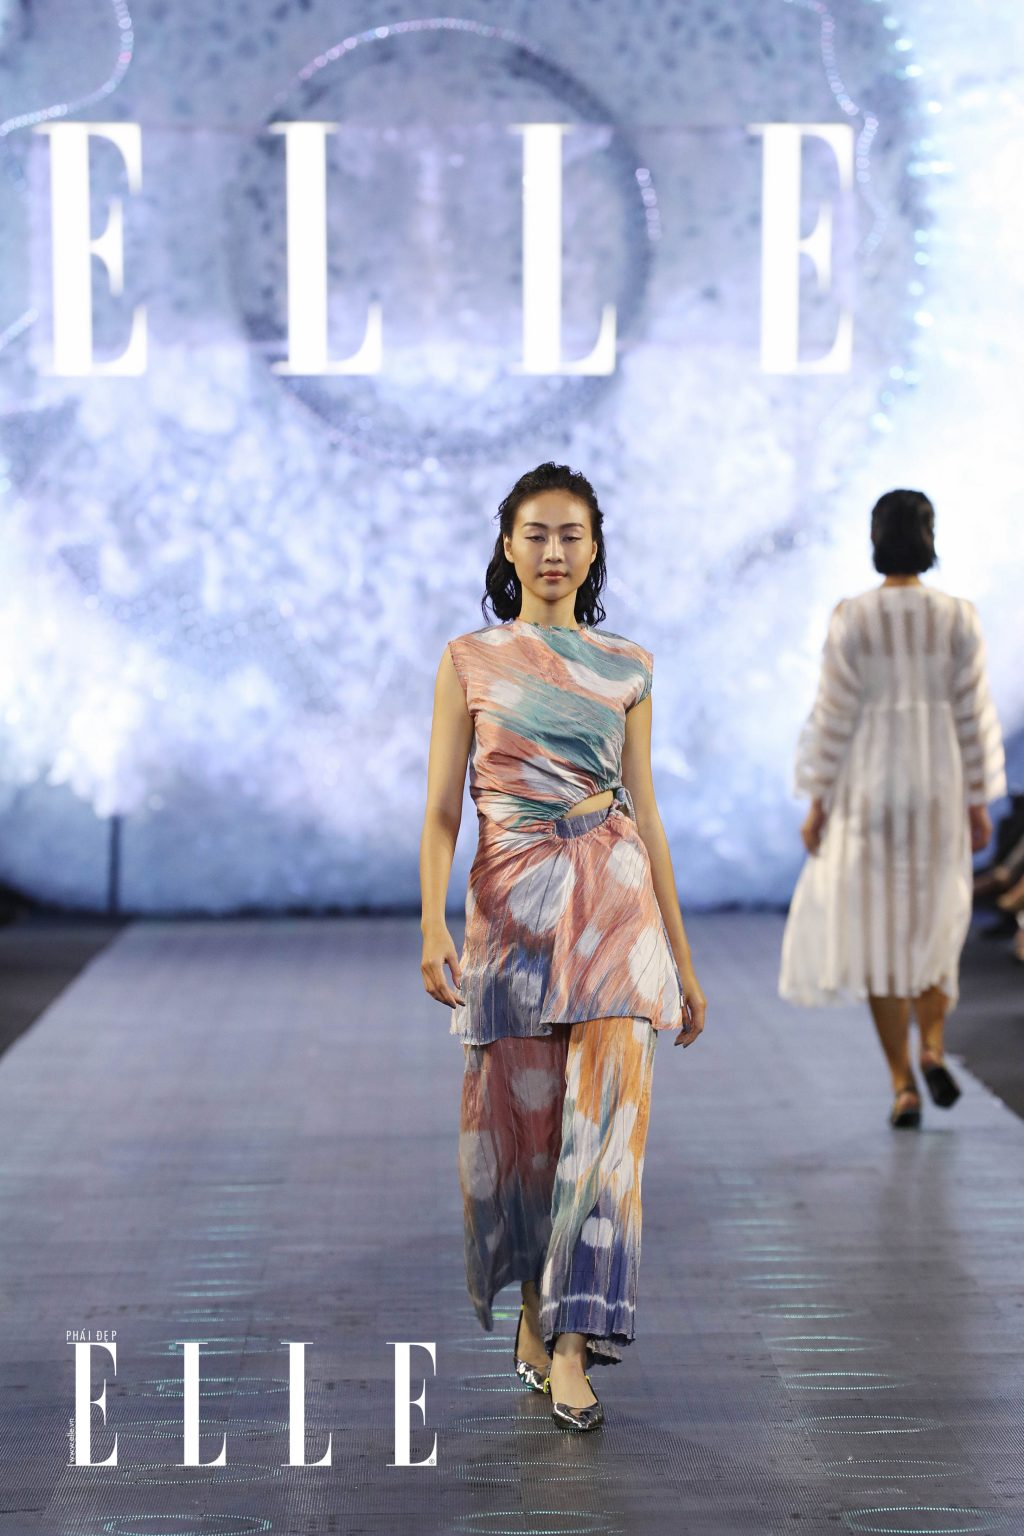 bst vinn pantararin elle fashion journey 2018 10